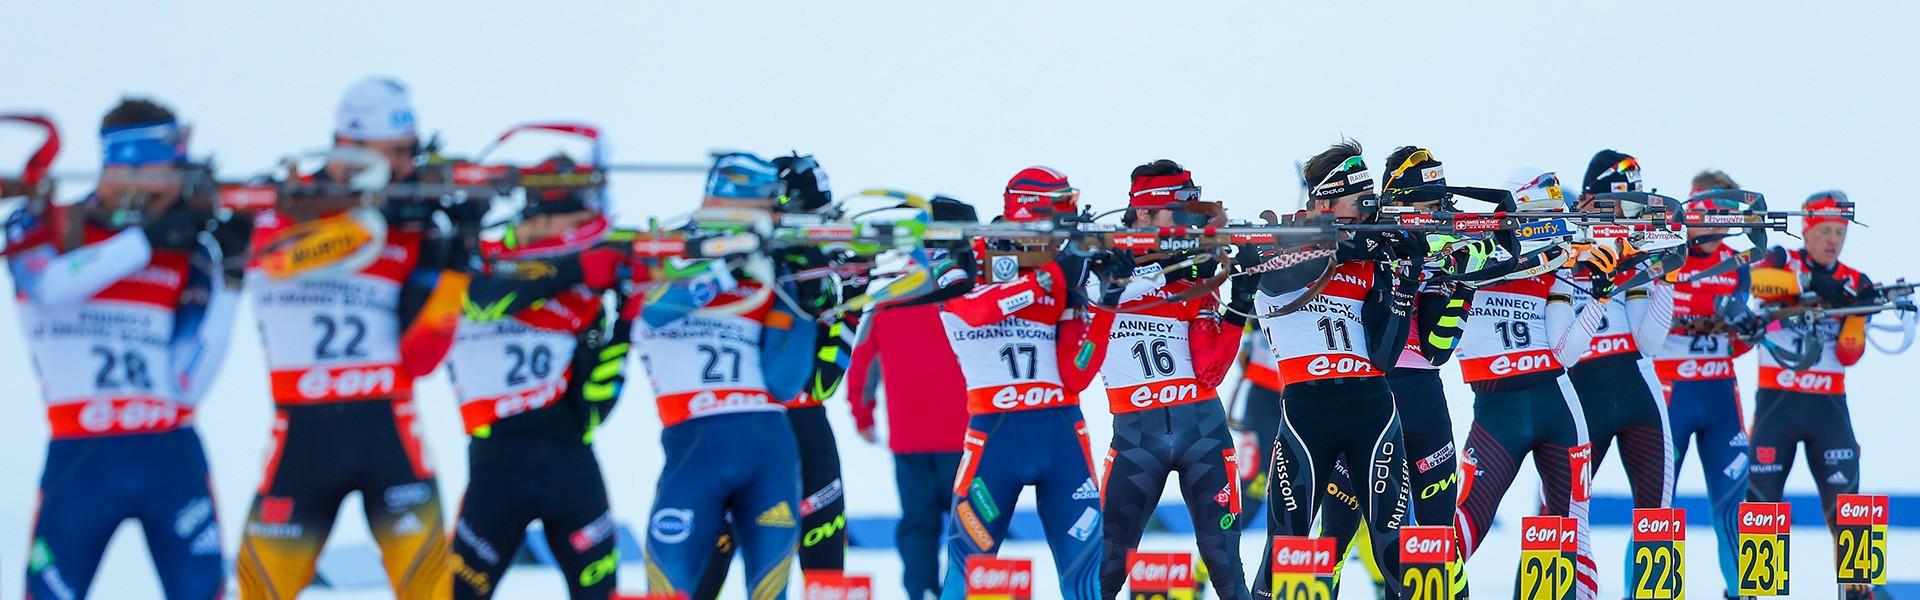 biathlon-zoom-agence-s-gruden-2588